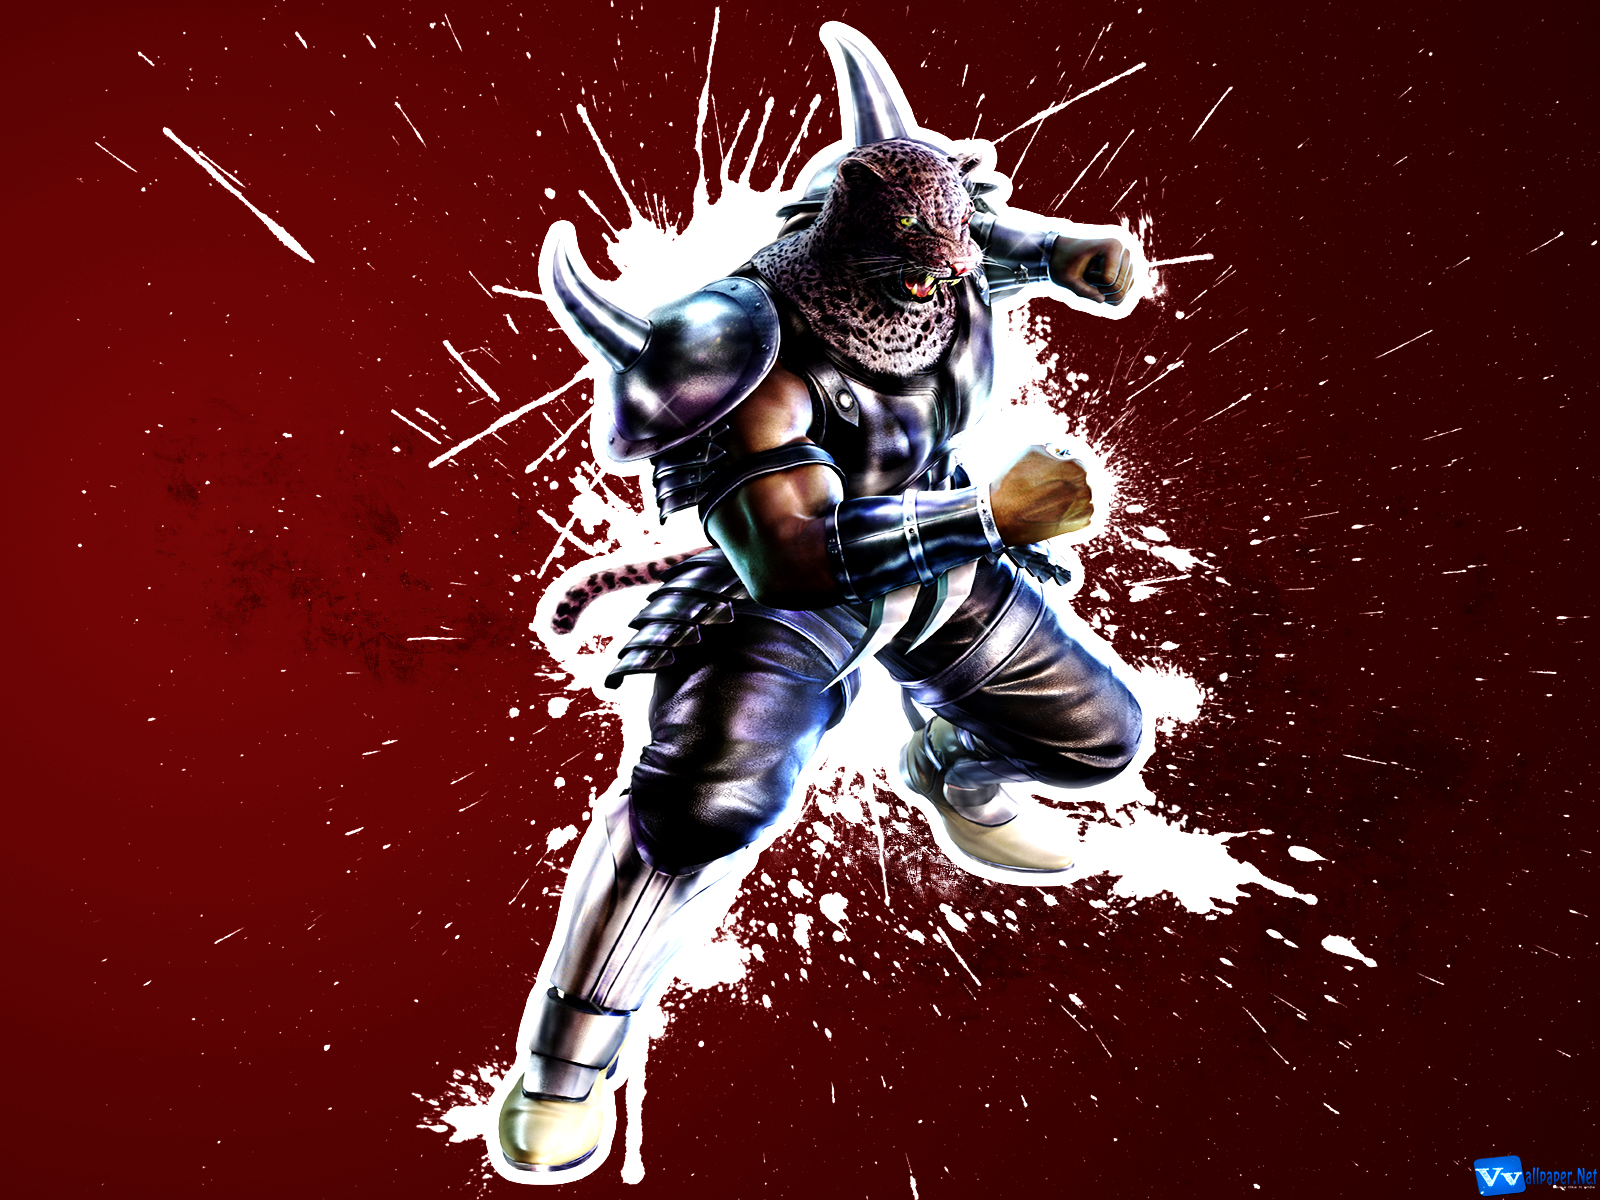 Armor King Tekken HD Wallpapers Download Wallpapers in HD for 1600x1200